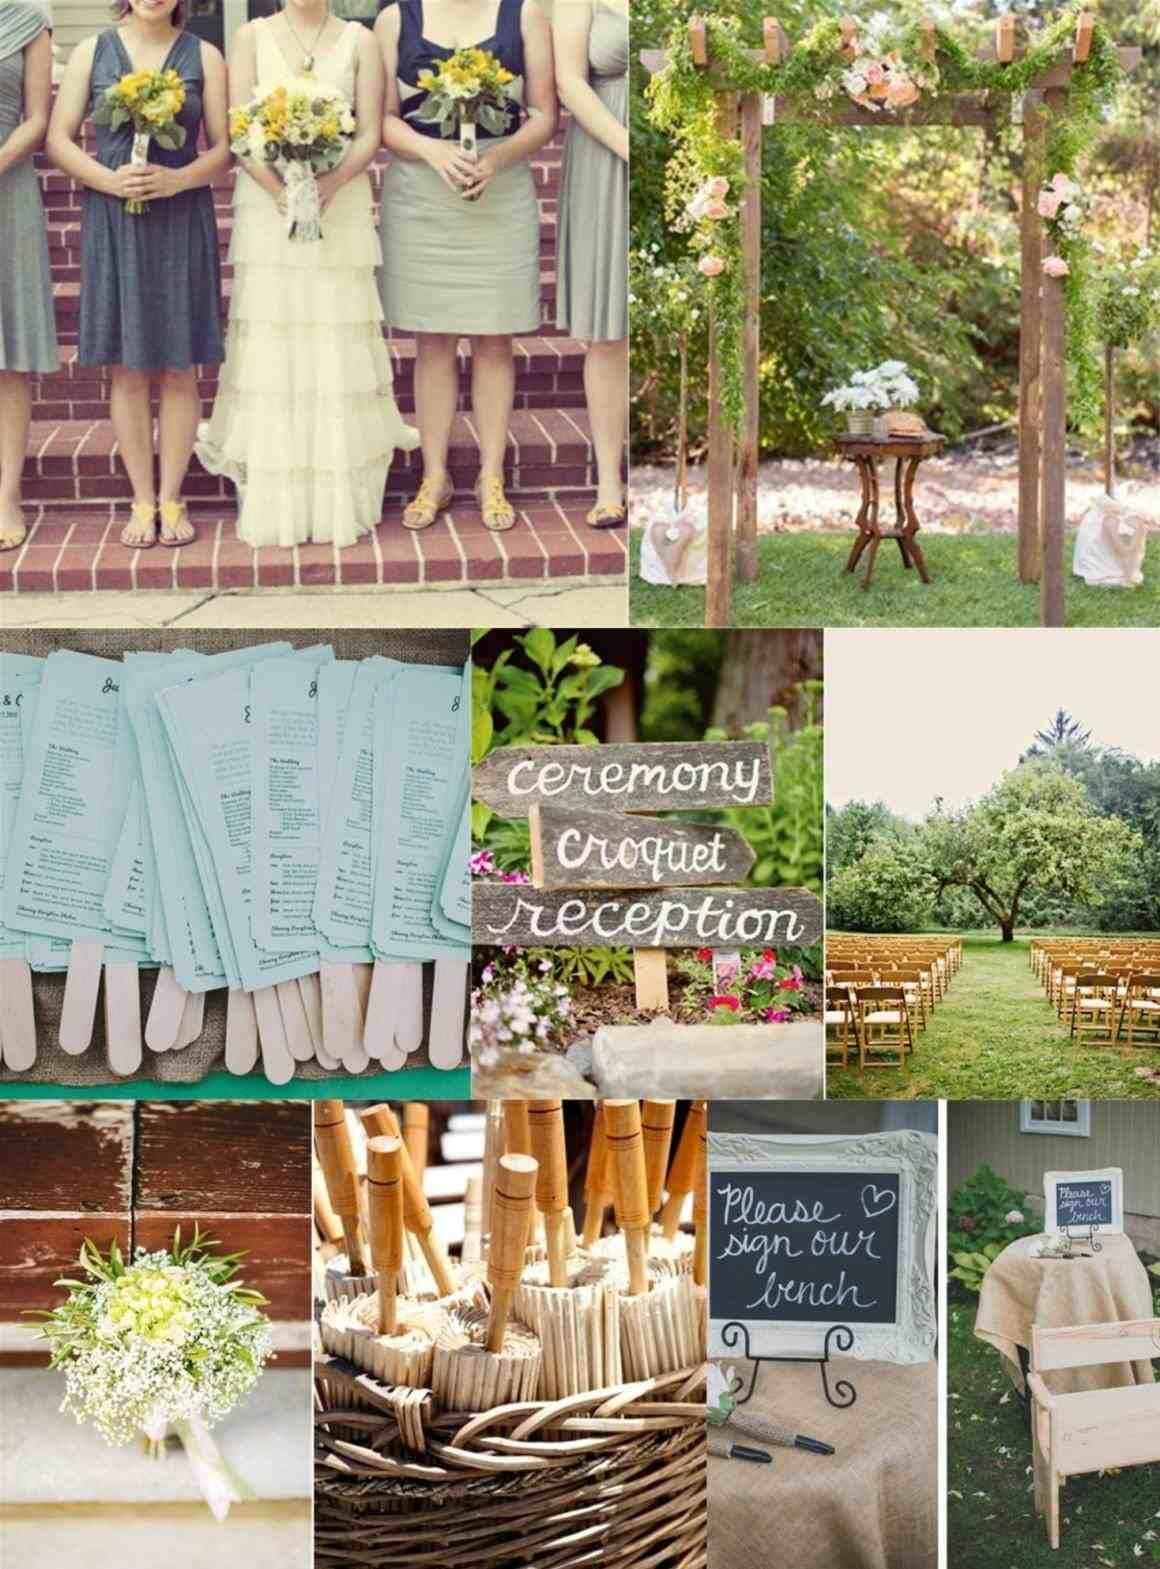 Top 10 New Post Very Small Backyard Wedding Ideas Visit Wedbridal Site